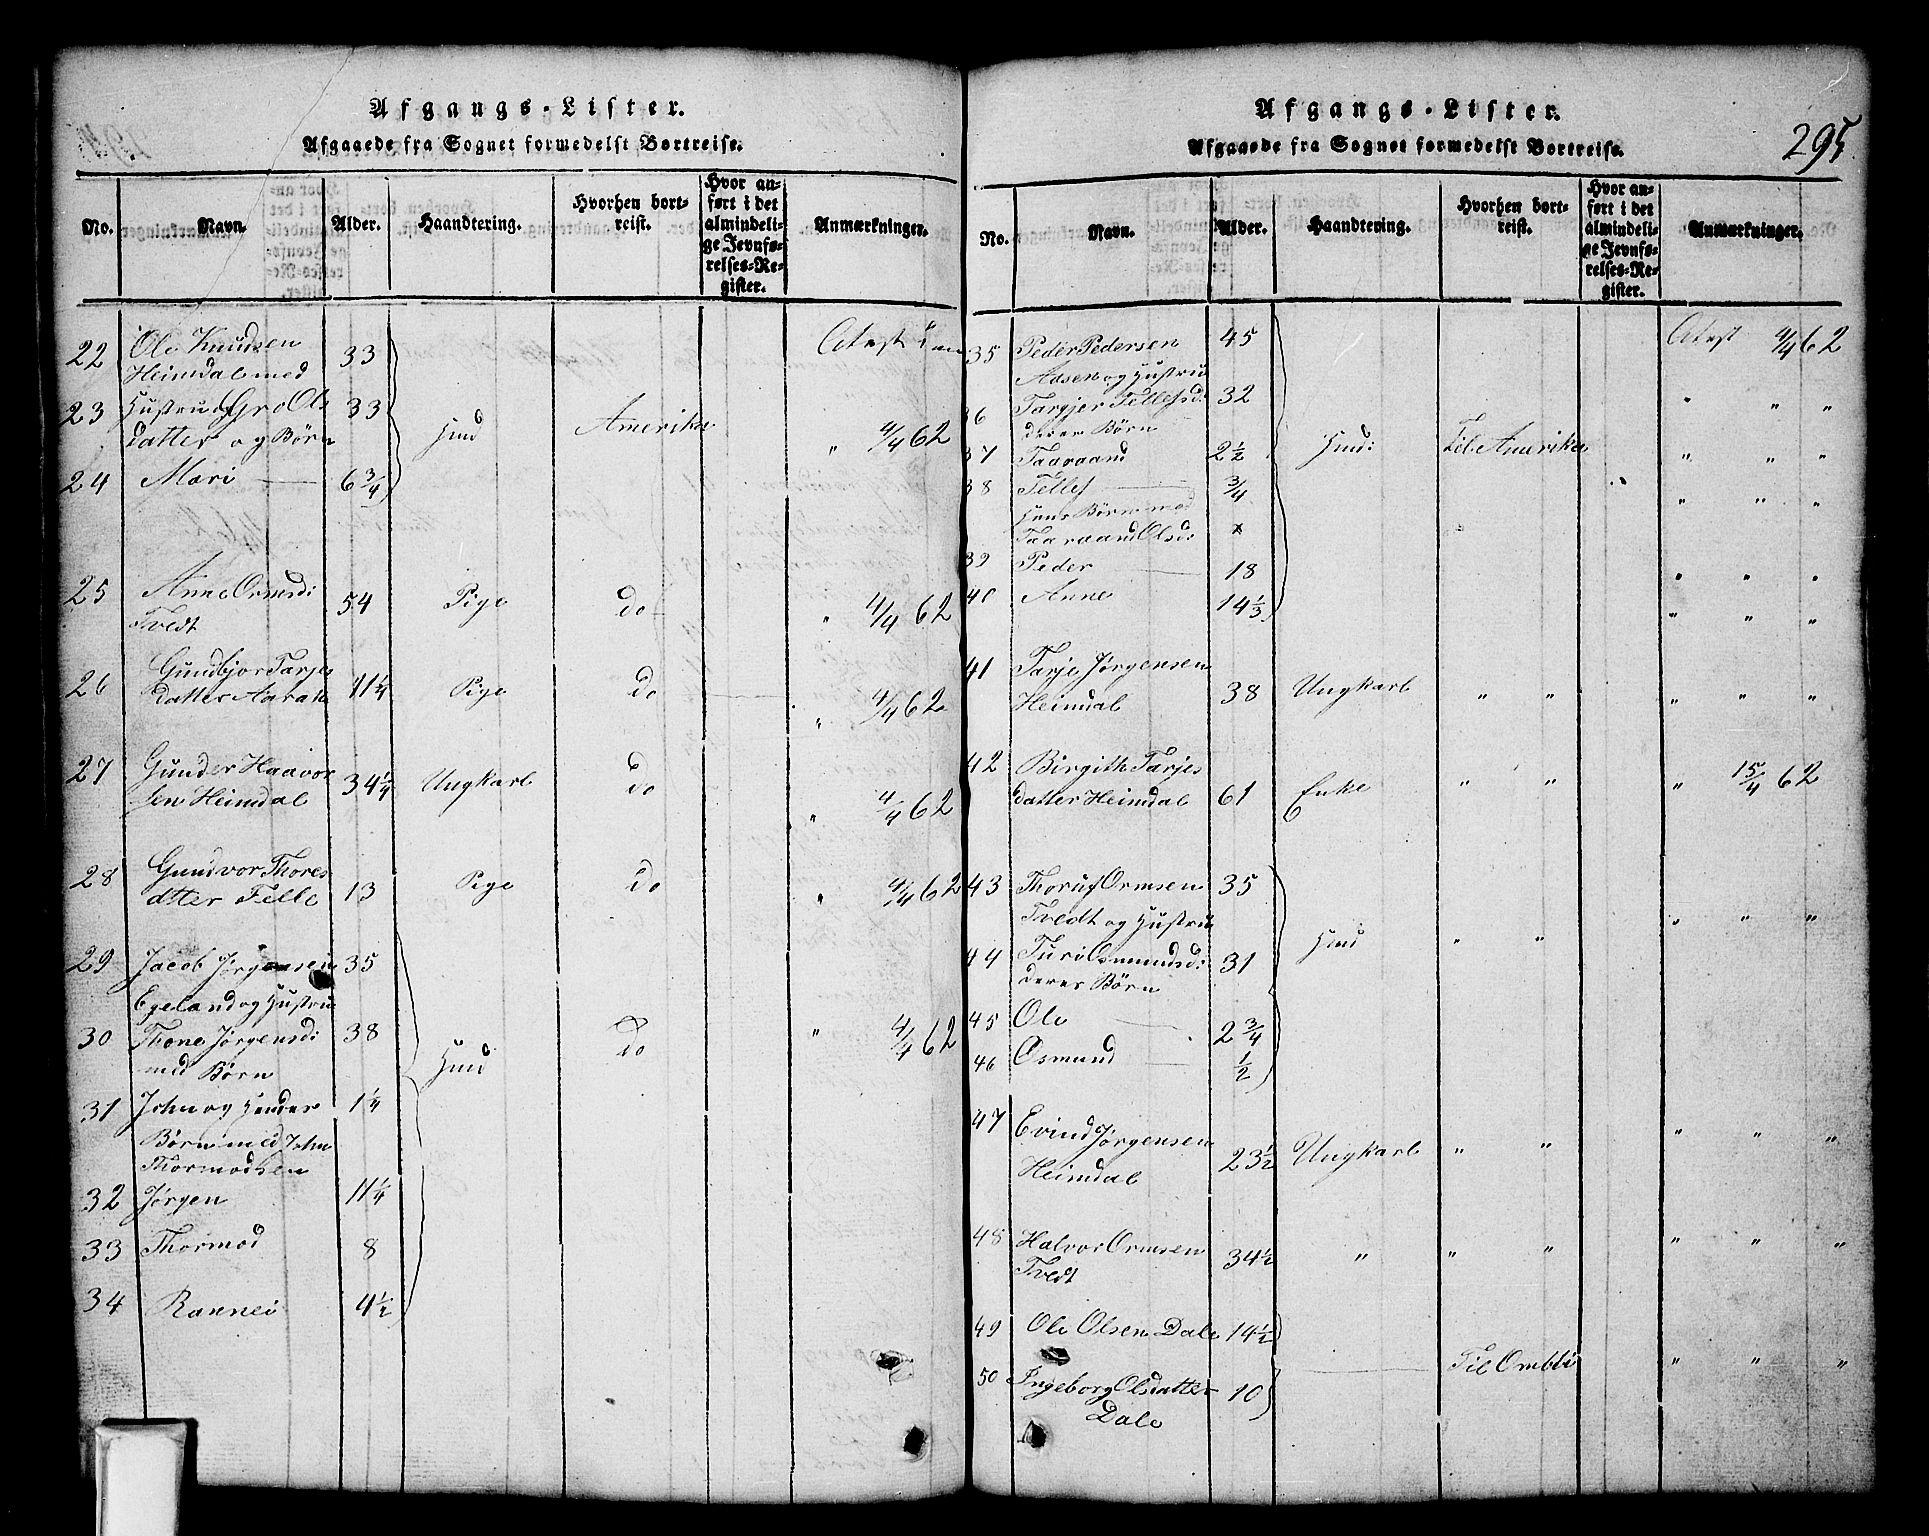 SAKO, Nissedal kirkebøker, G/Gb/L0001: Klokkerbok nr. II 1, 1814-1862, s. 295